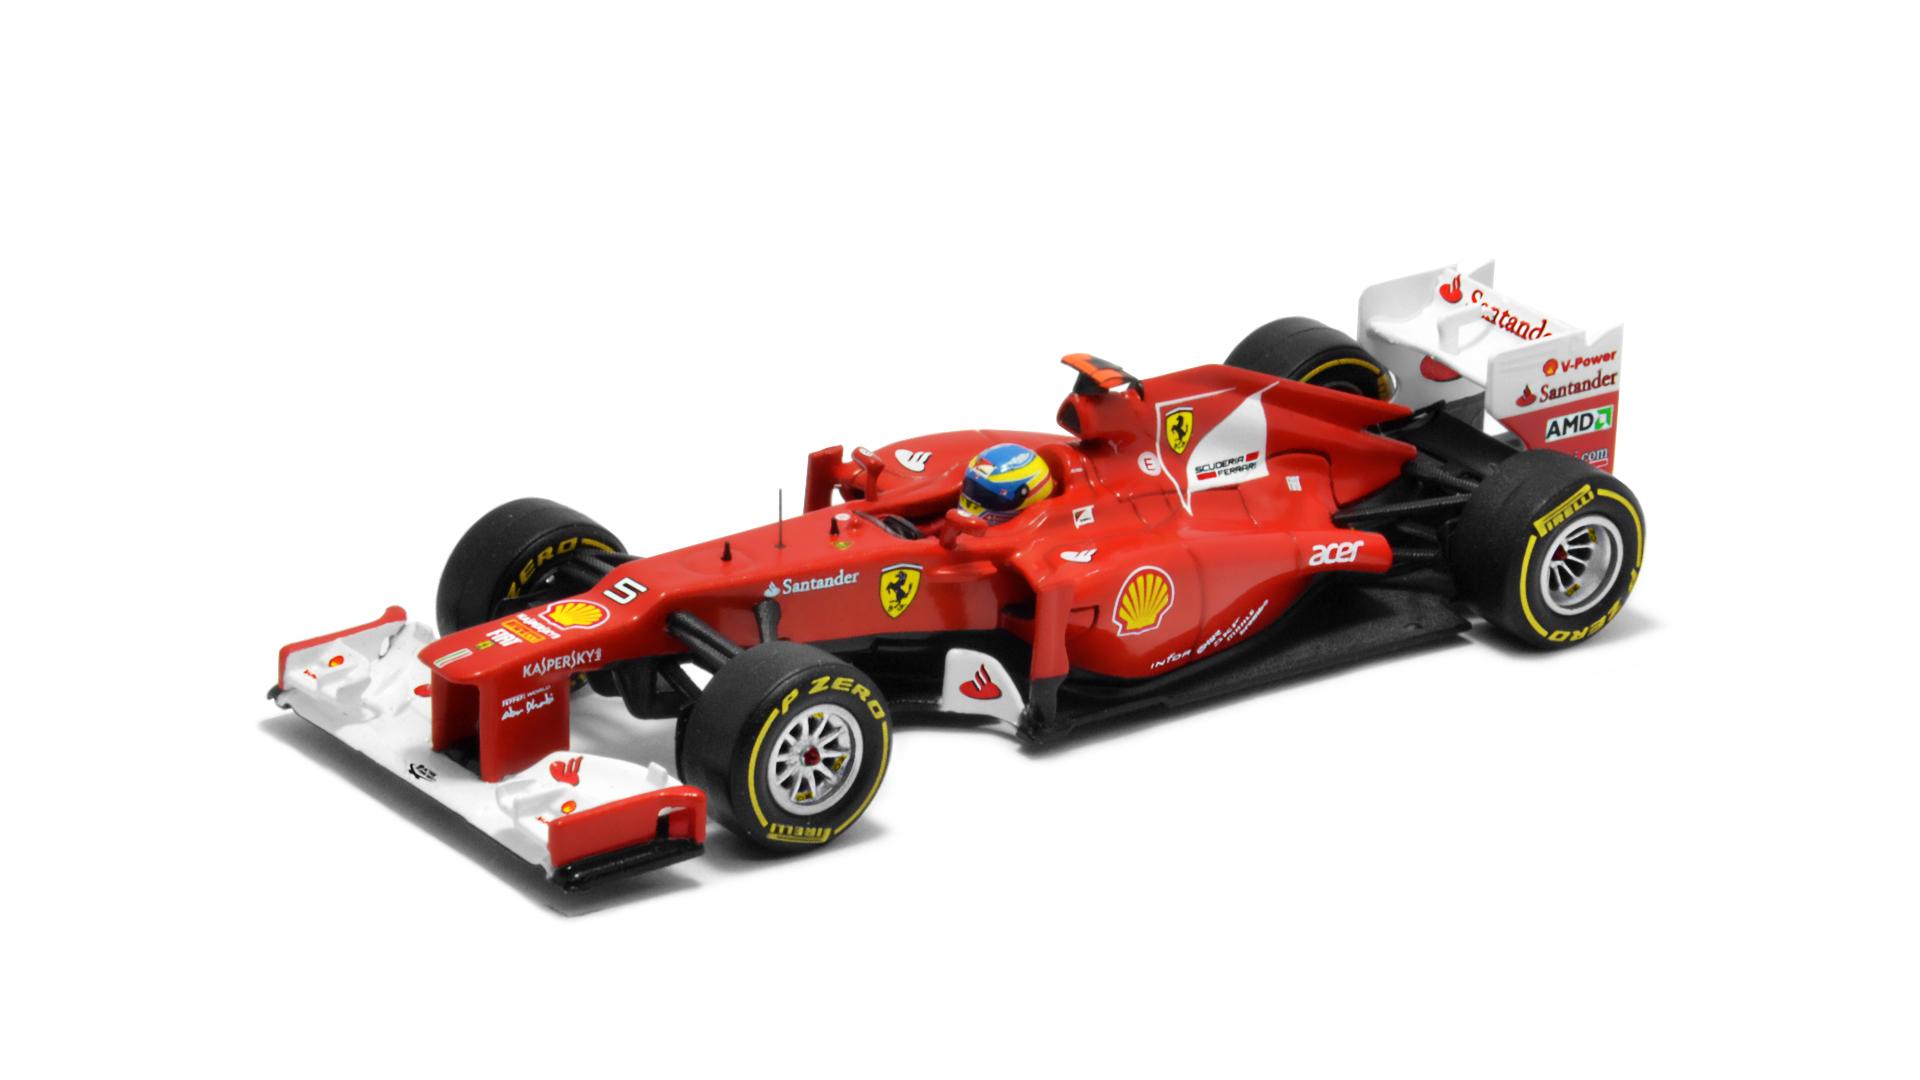 Év: 2012<br />Modell: F2012<br />Gyártó: Hot Wheels<br />Pilóta: Fernando Alonso